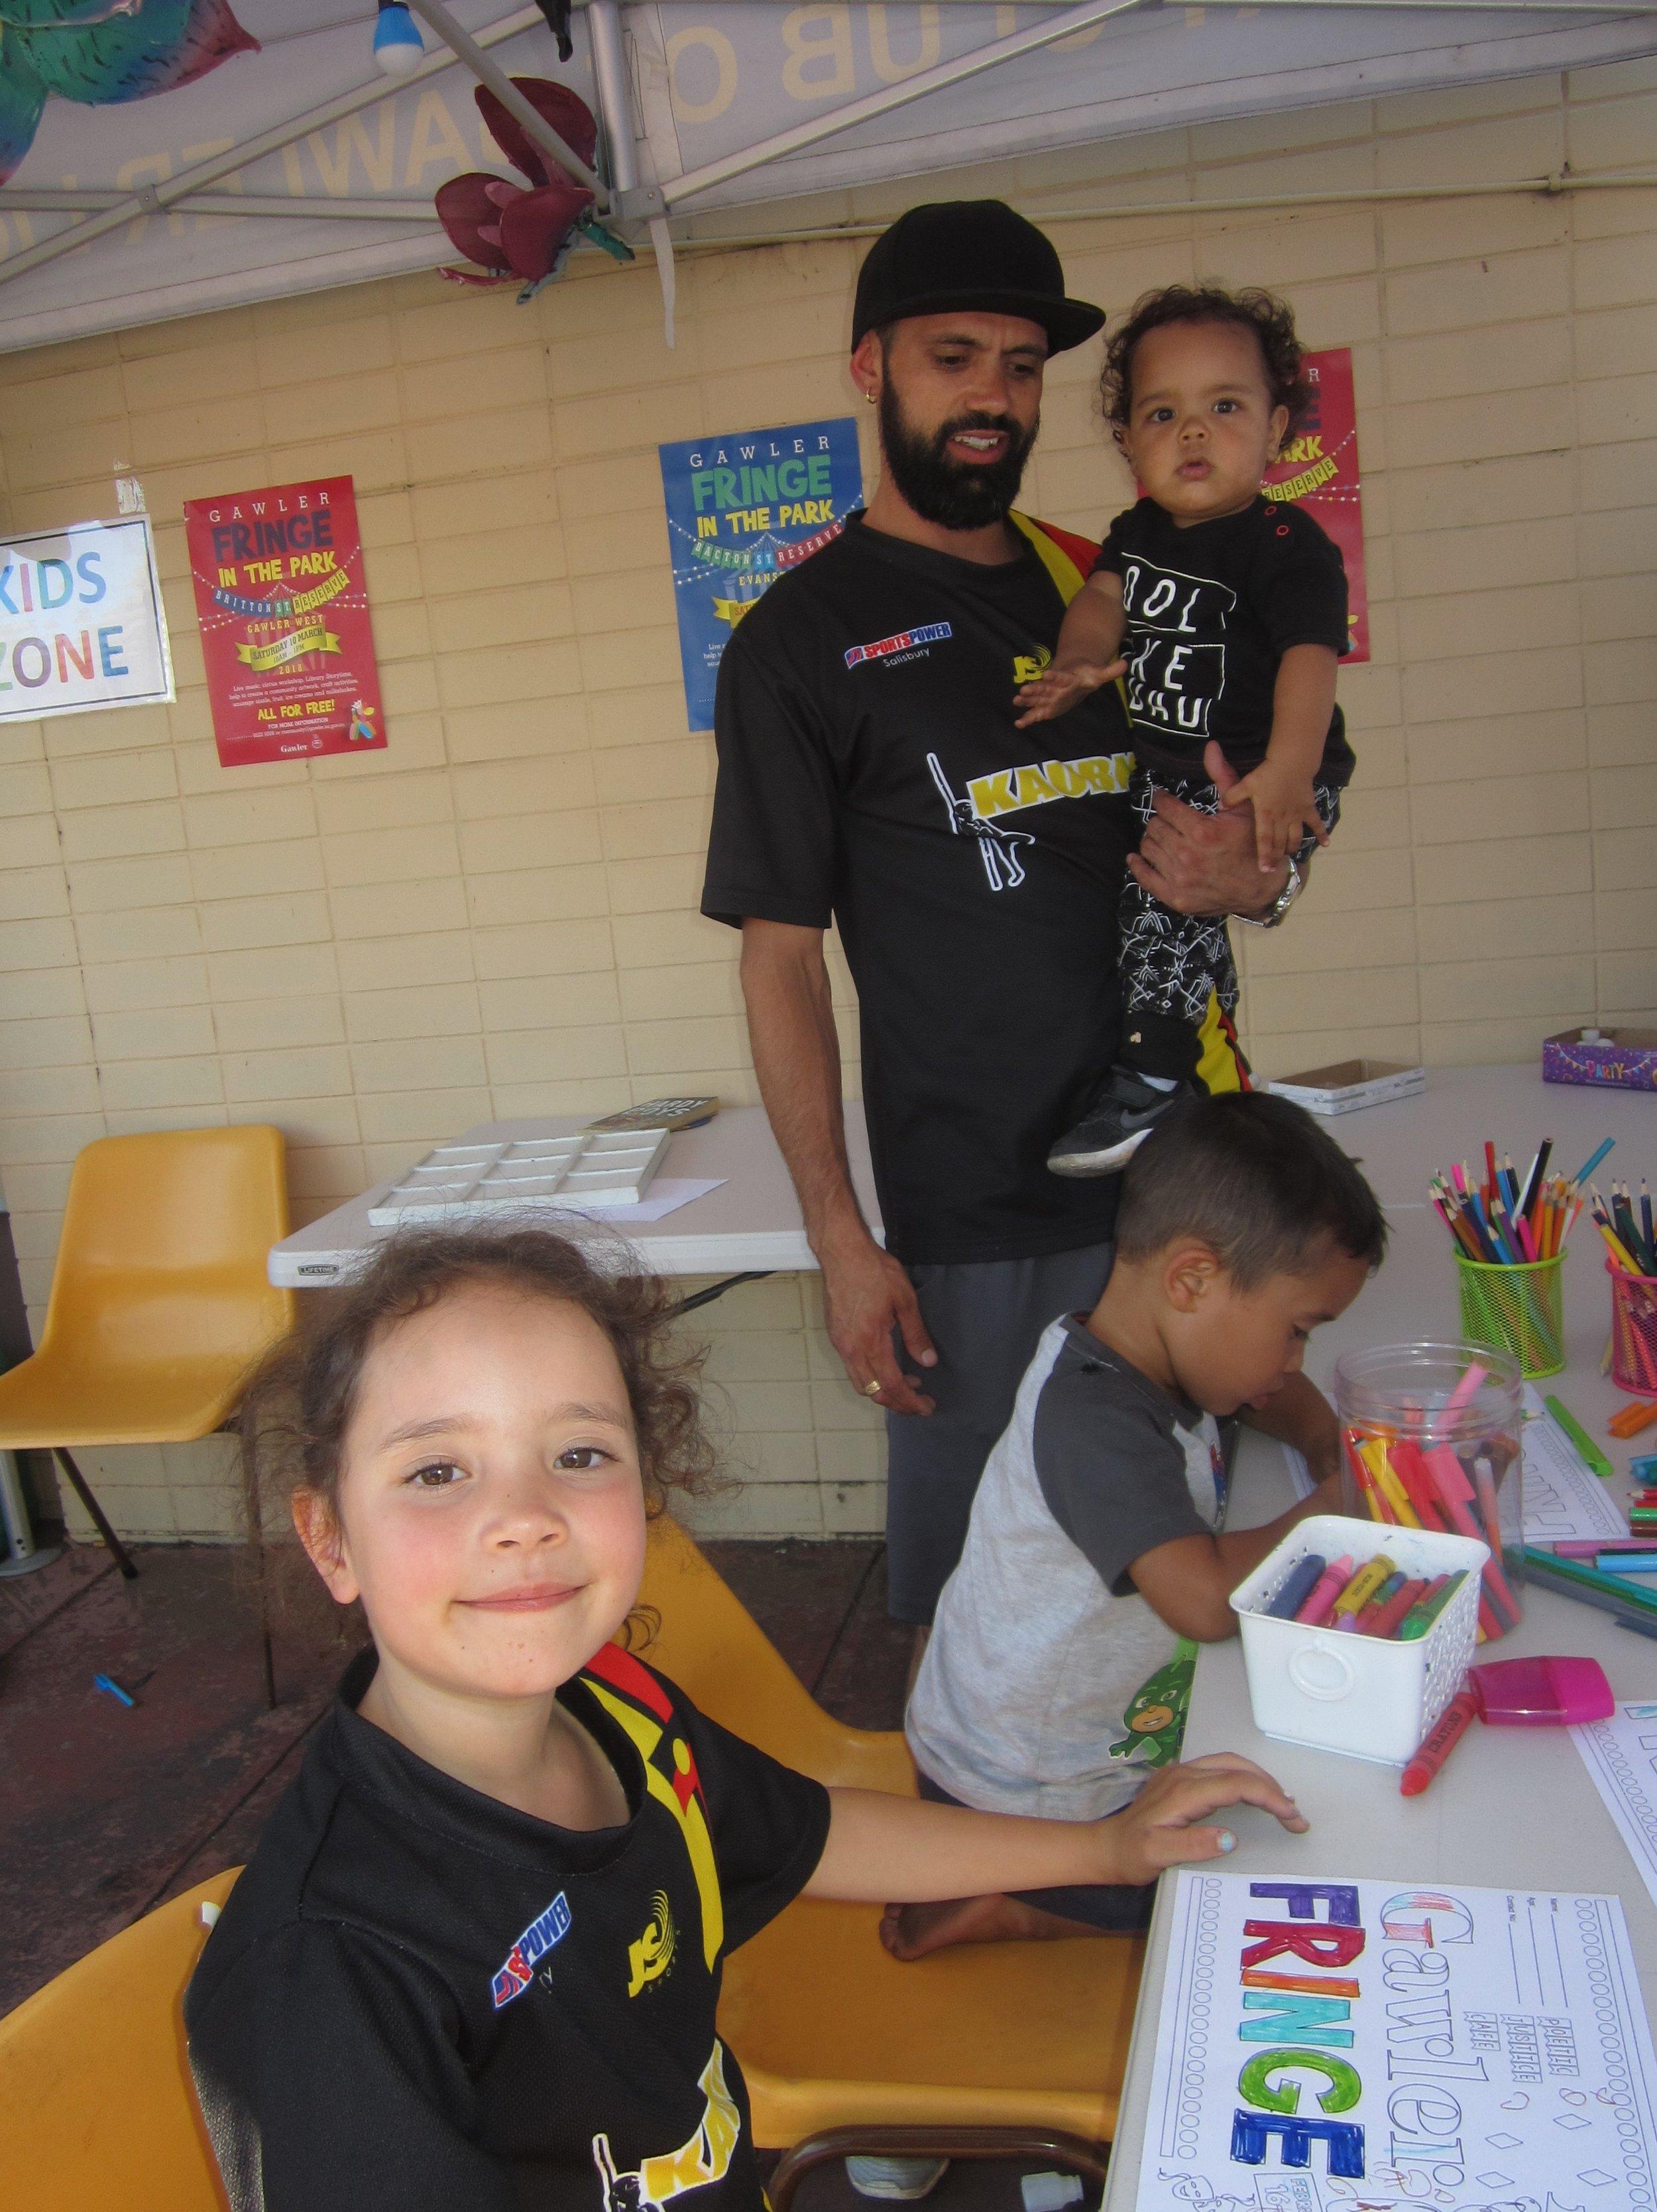 Jack Buckskin with his children in the Kids Zone.